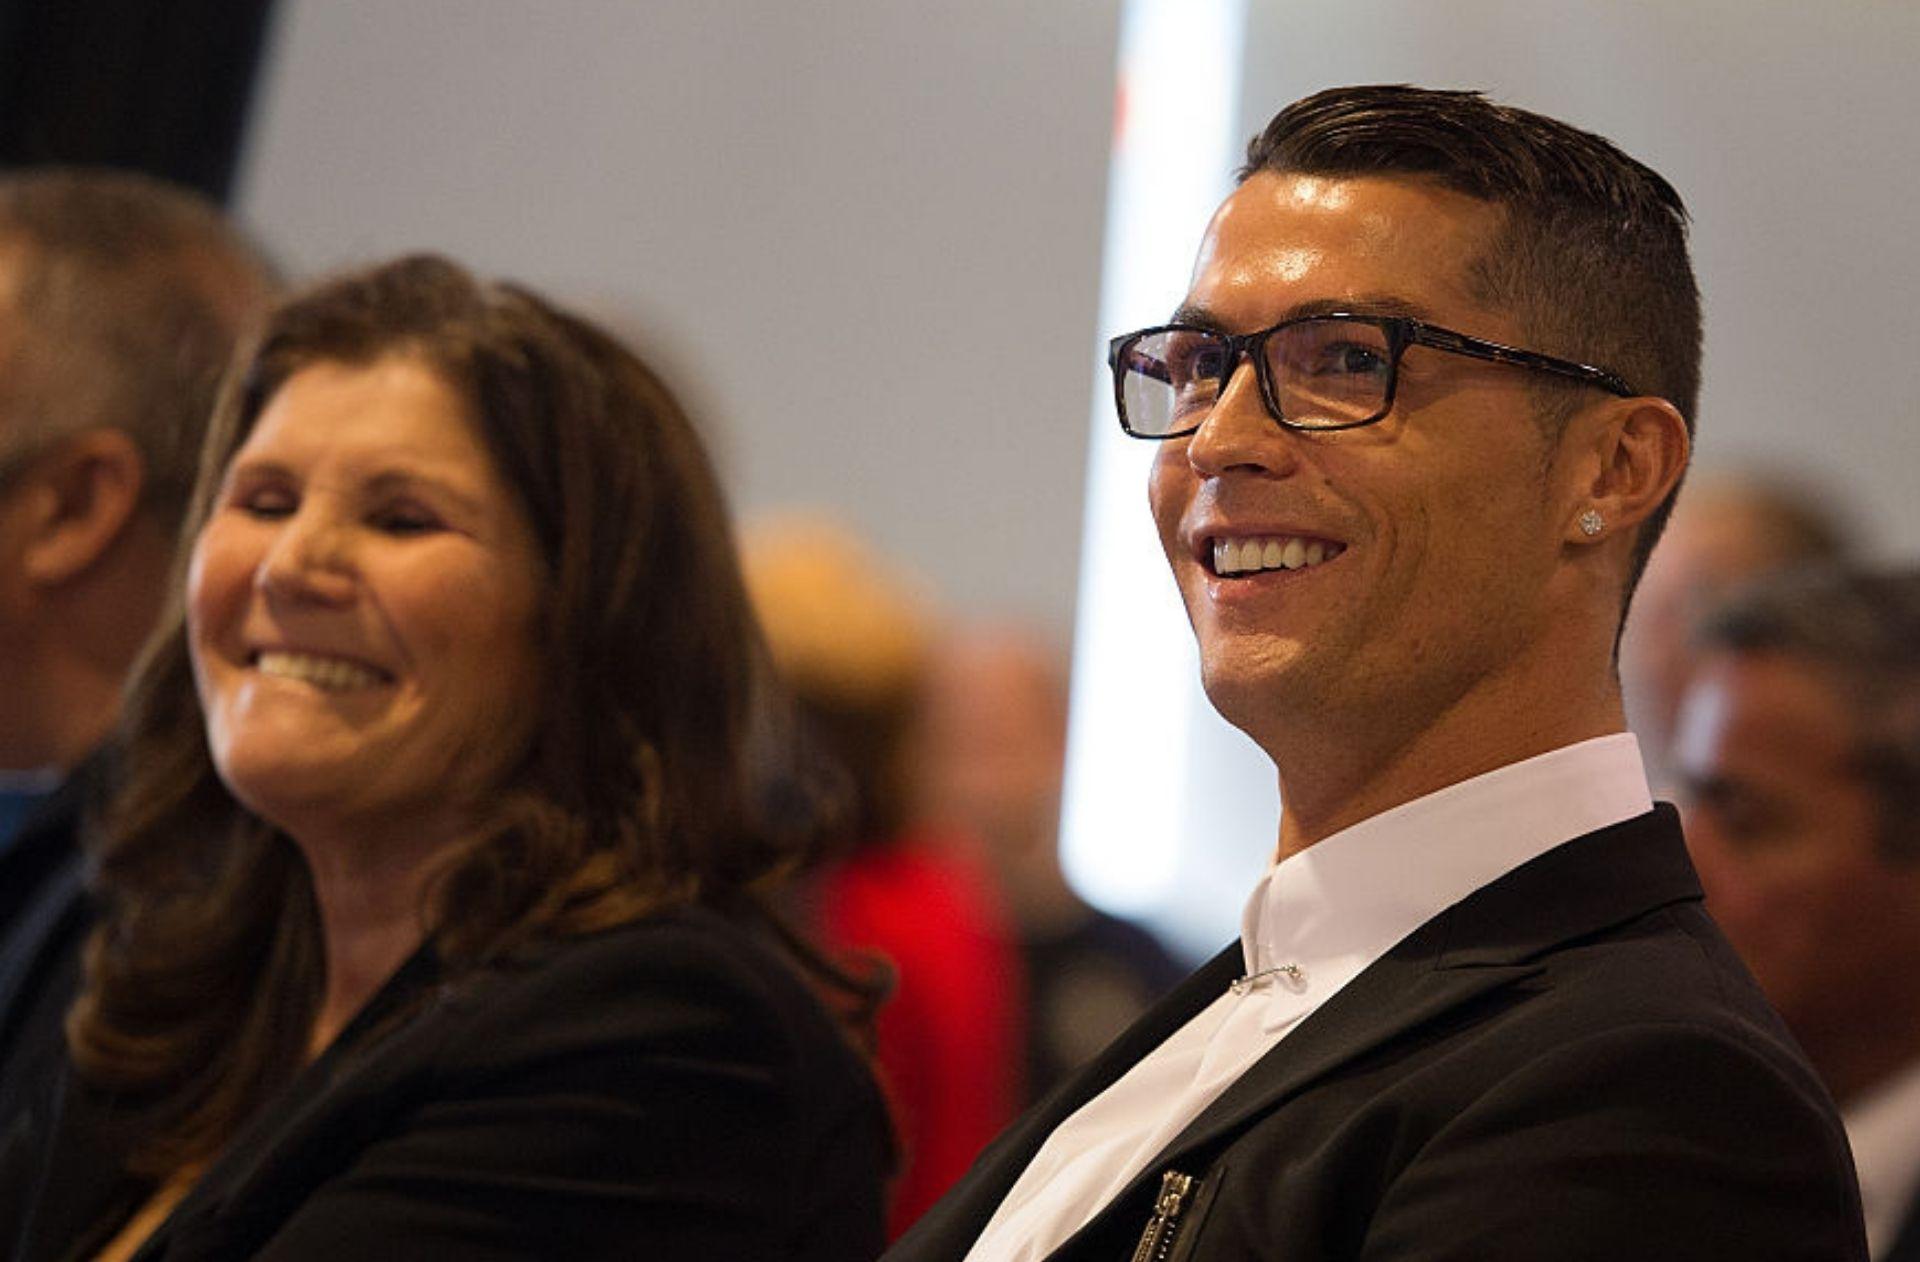 Cristiano Ronaldo with mother Dolores Ronaldo